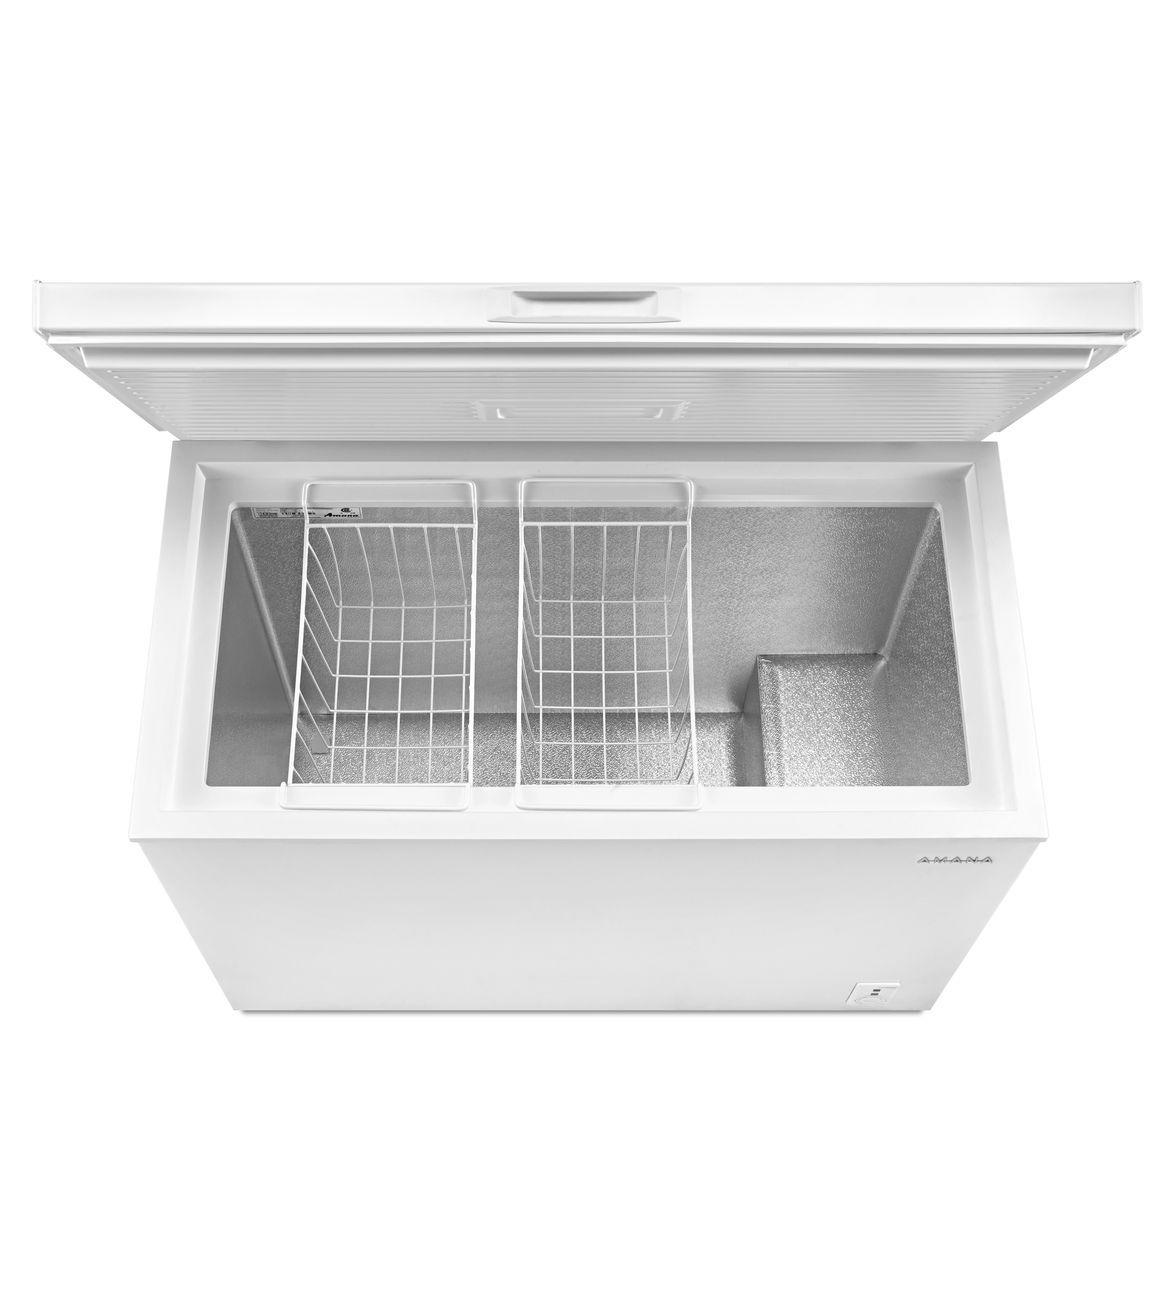 Ge Upright Freezer Manual Aqc0902drw Amanaar 90 Cu Ft Compact Chest Freezer